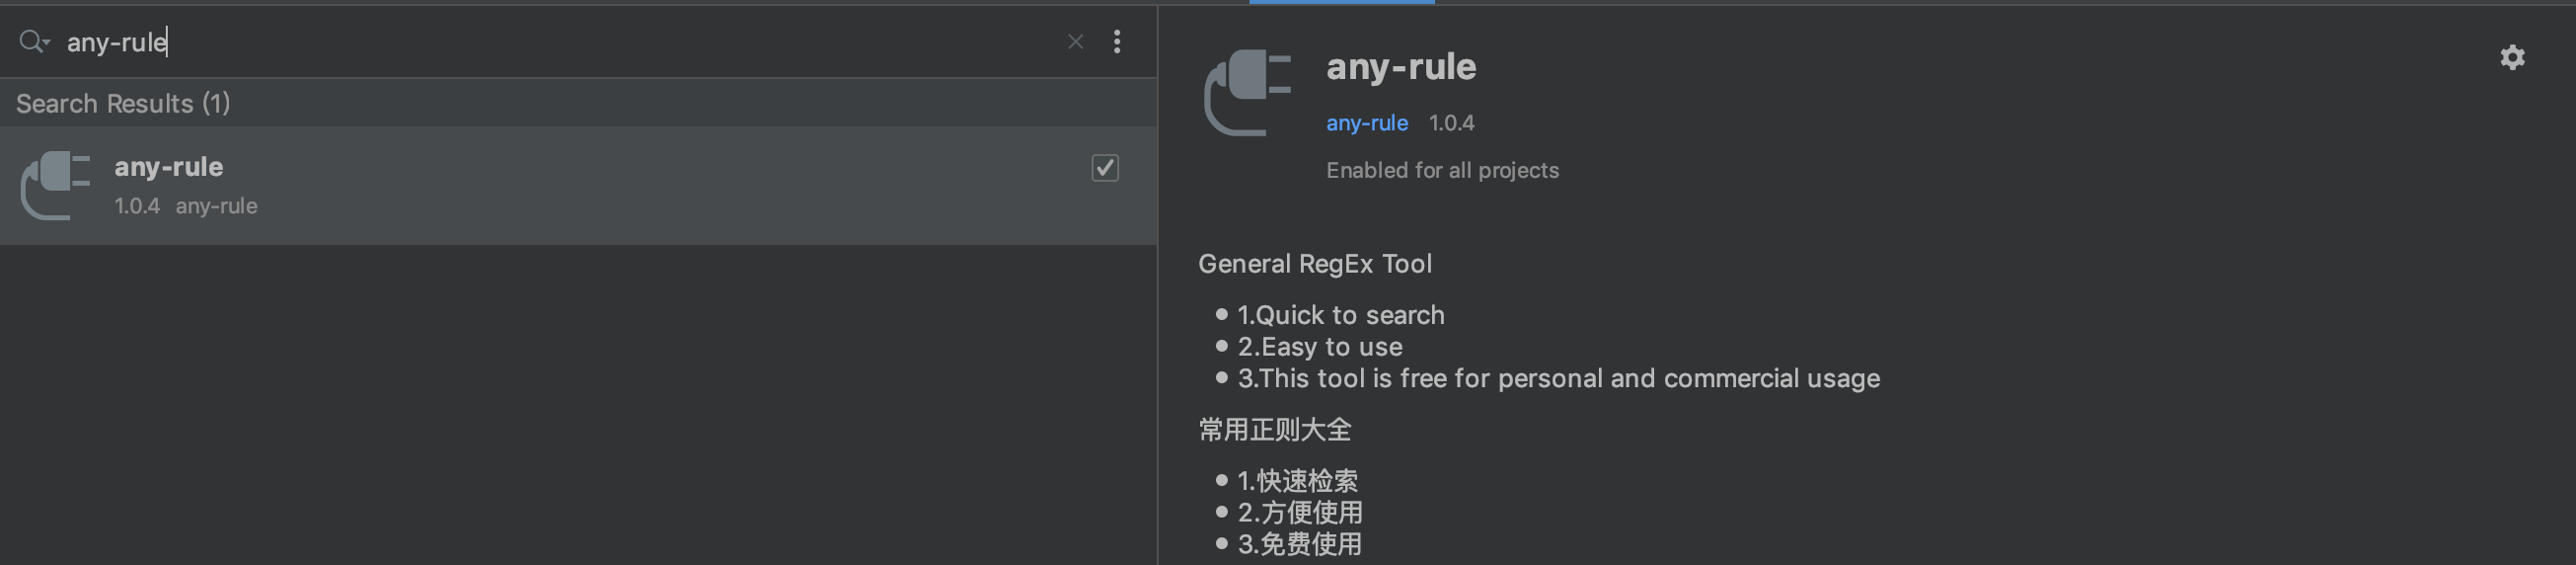 any-rule